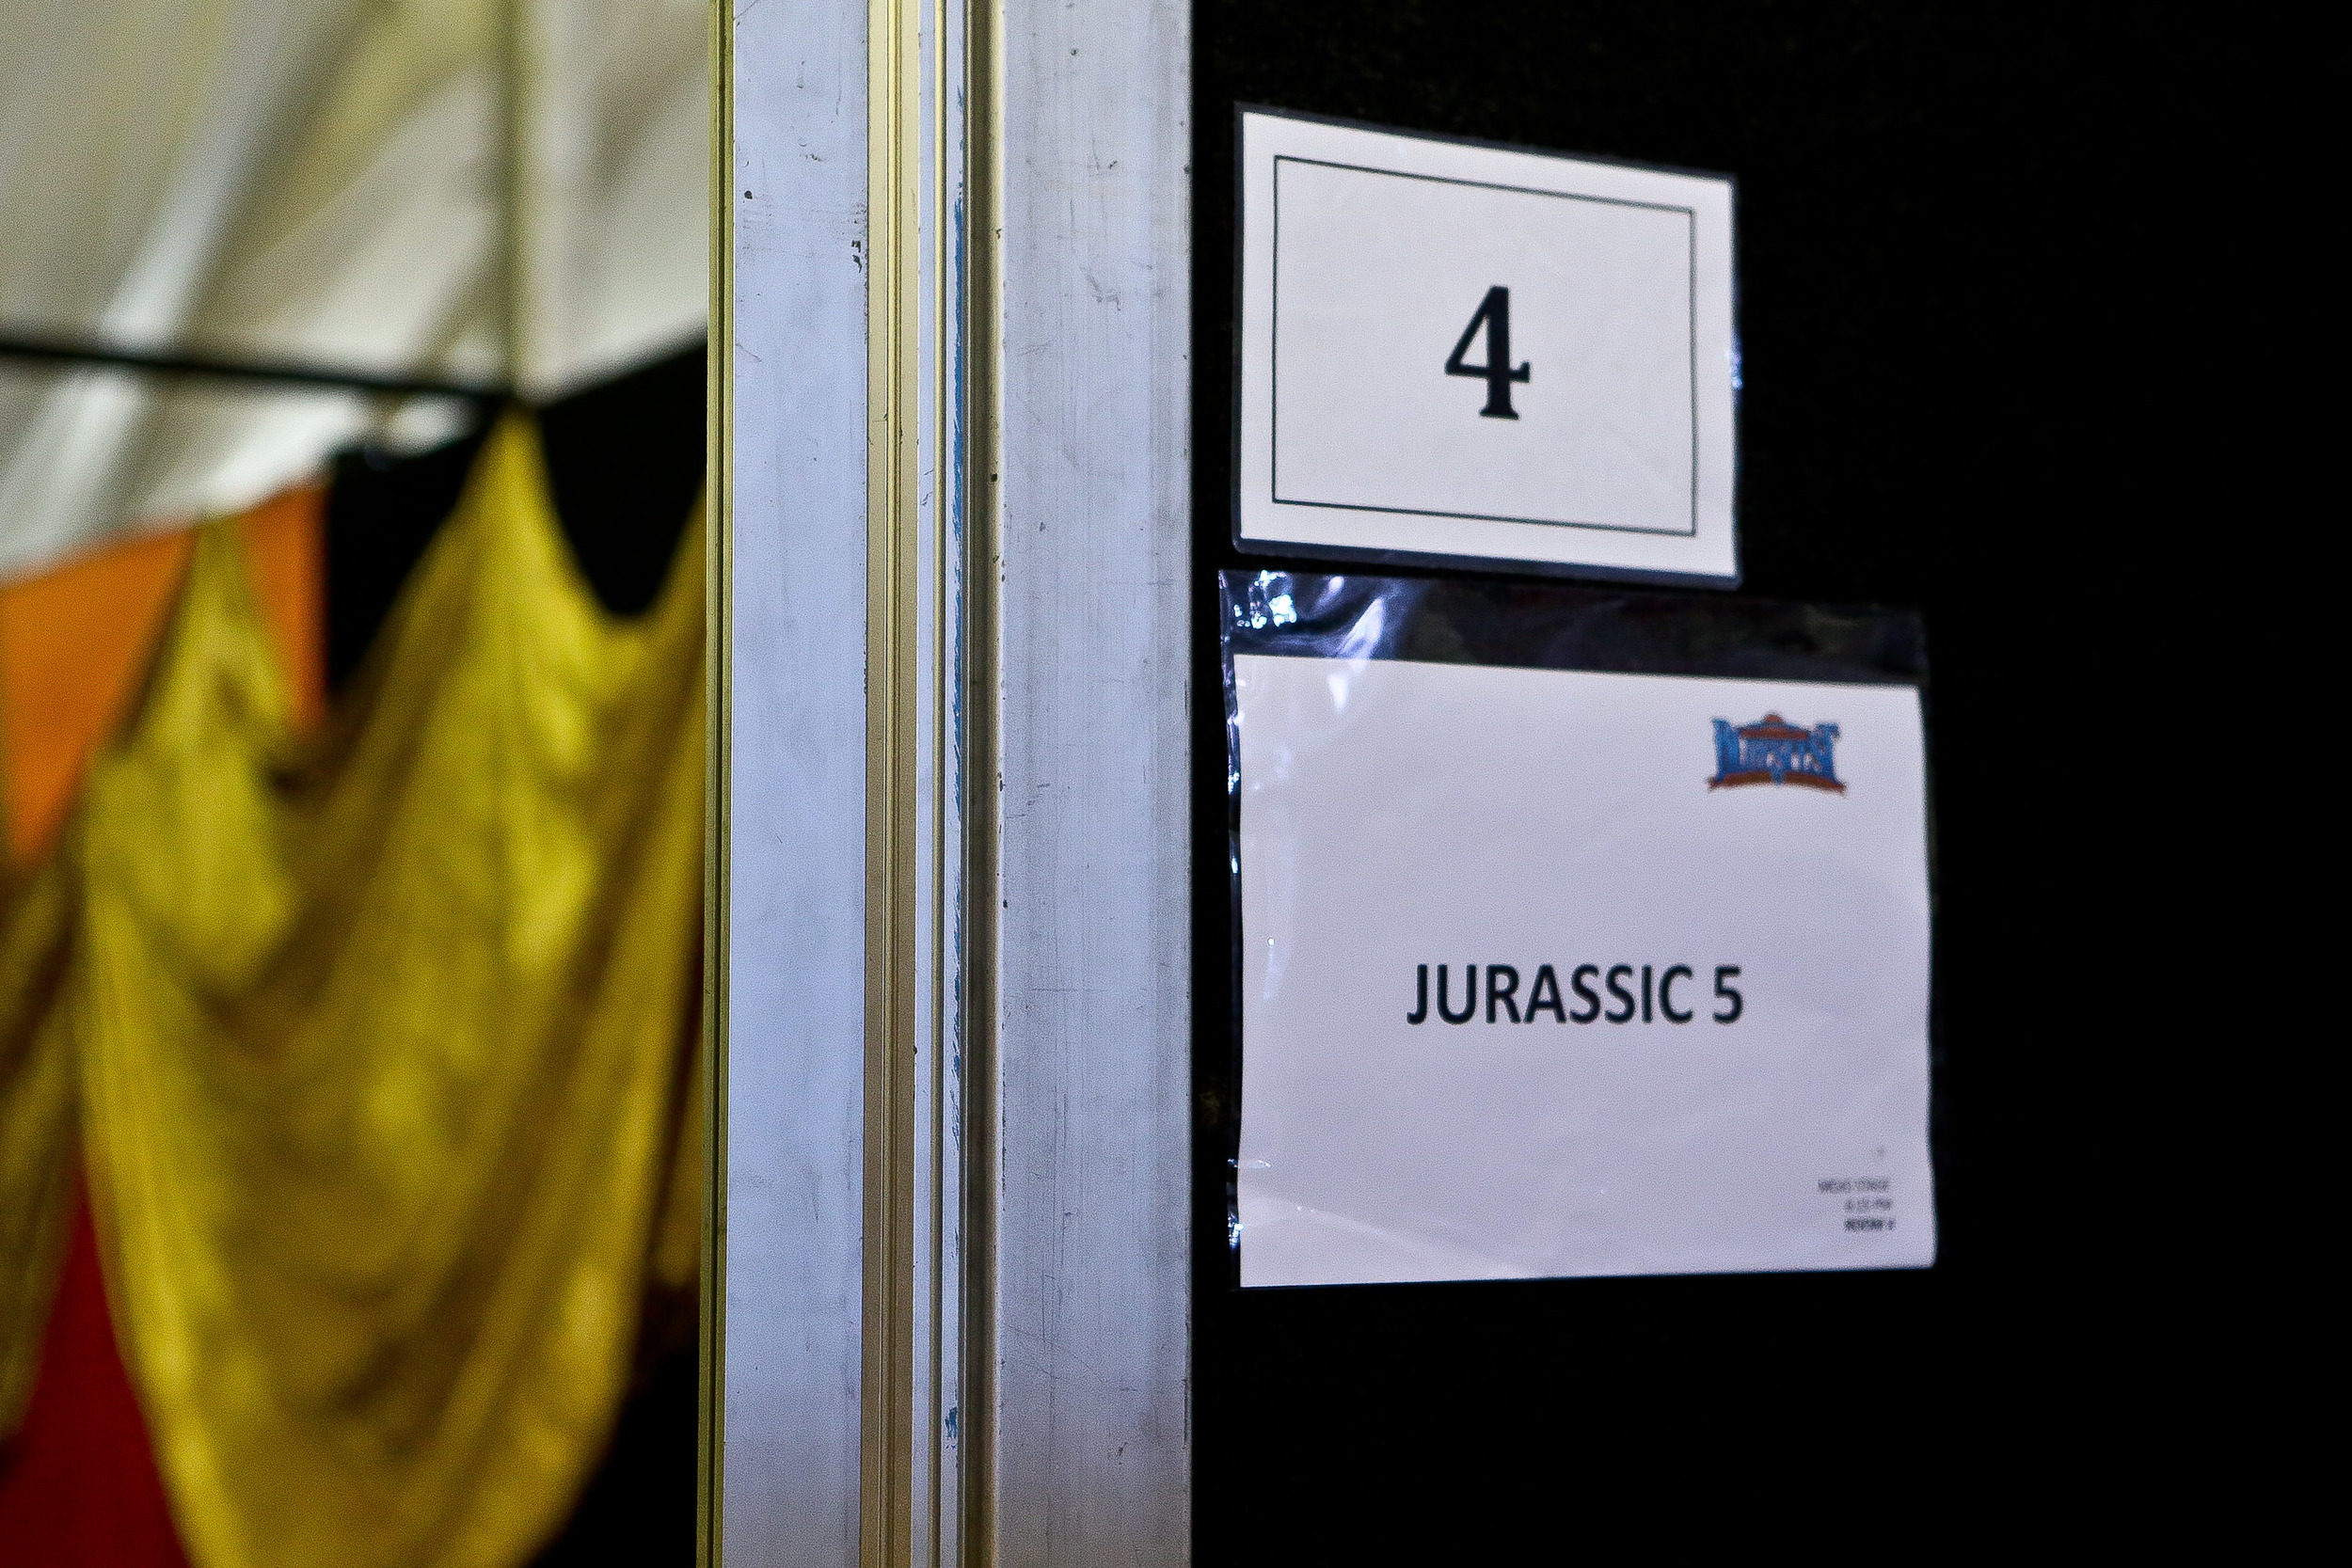 jurassic 5 (day one)_bluesfest15_josh groom (0).jpg